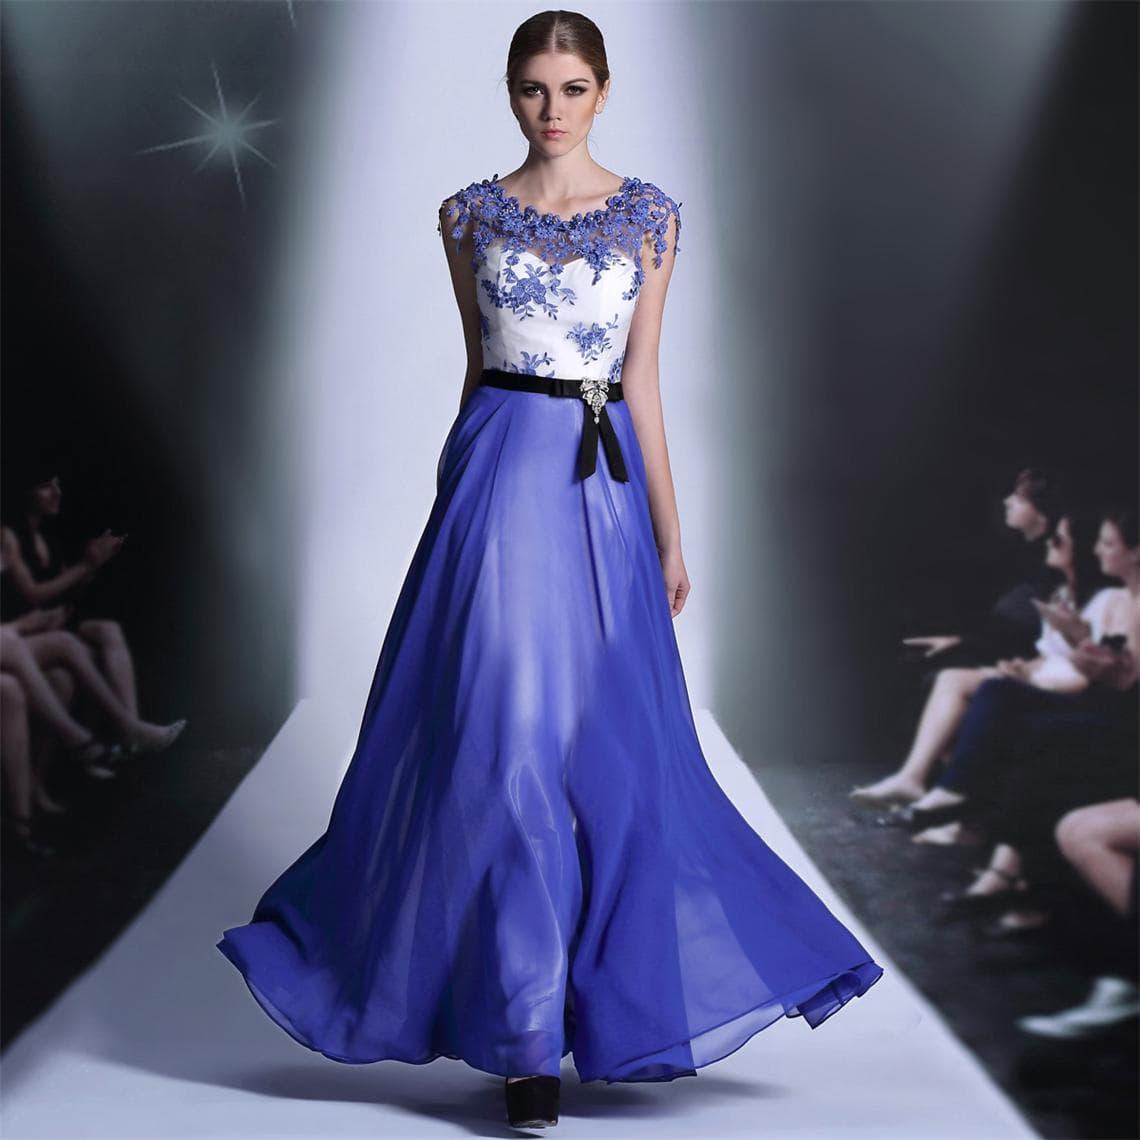 New Fashion Prom Dresses,Bridesmaid Dresses,Cocktail Dresses,Formal ...